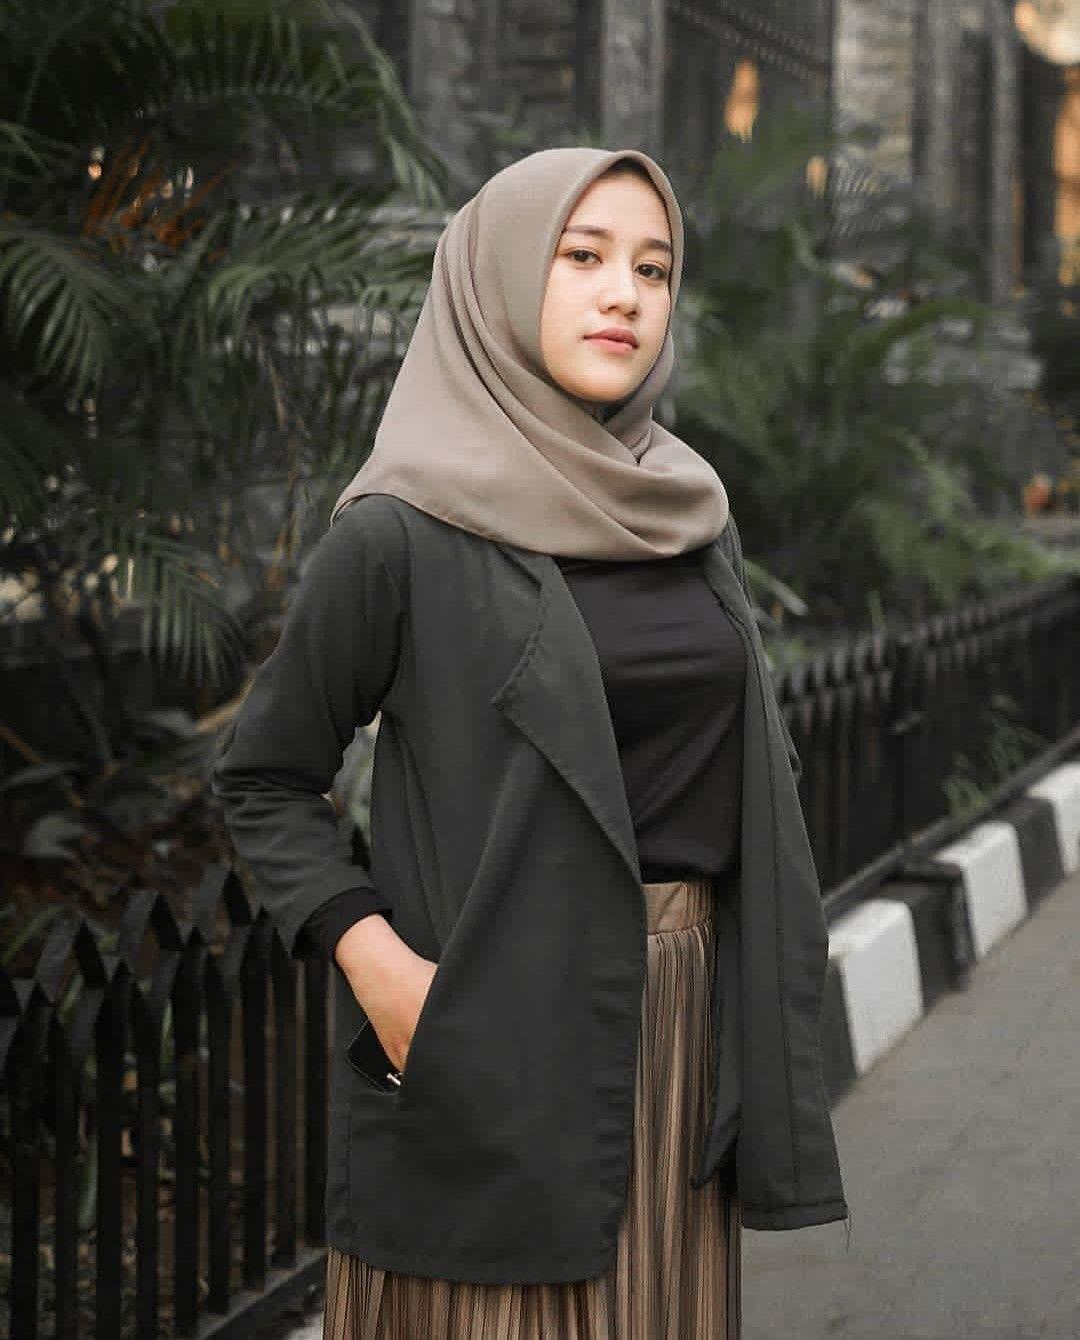 Pin oleh Ancha Arts di fashion di 2020 Gaya hijab